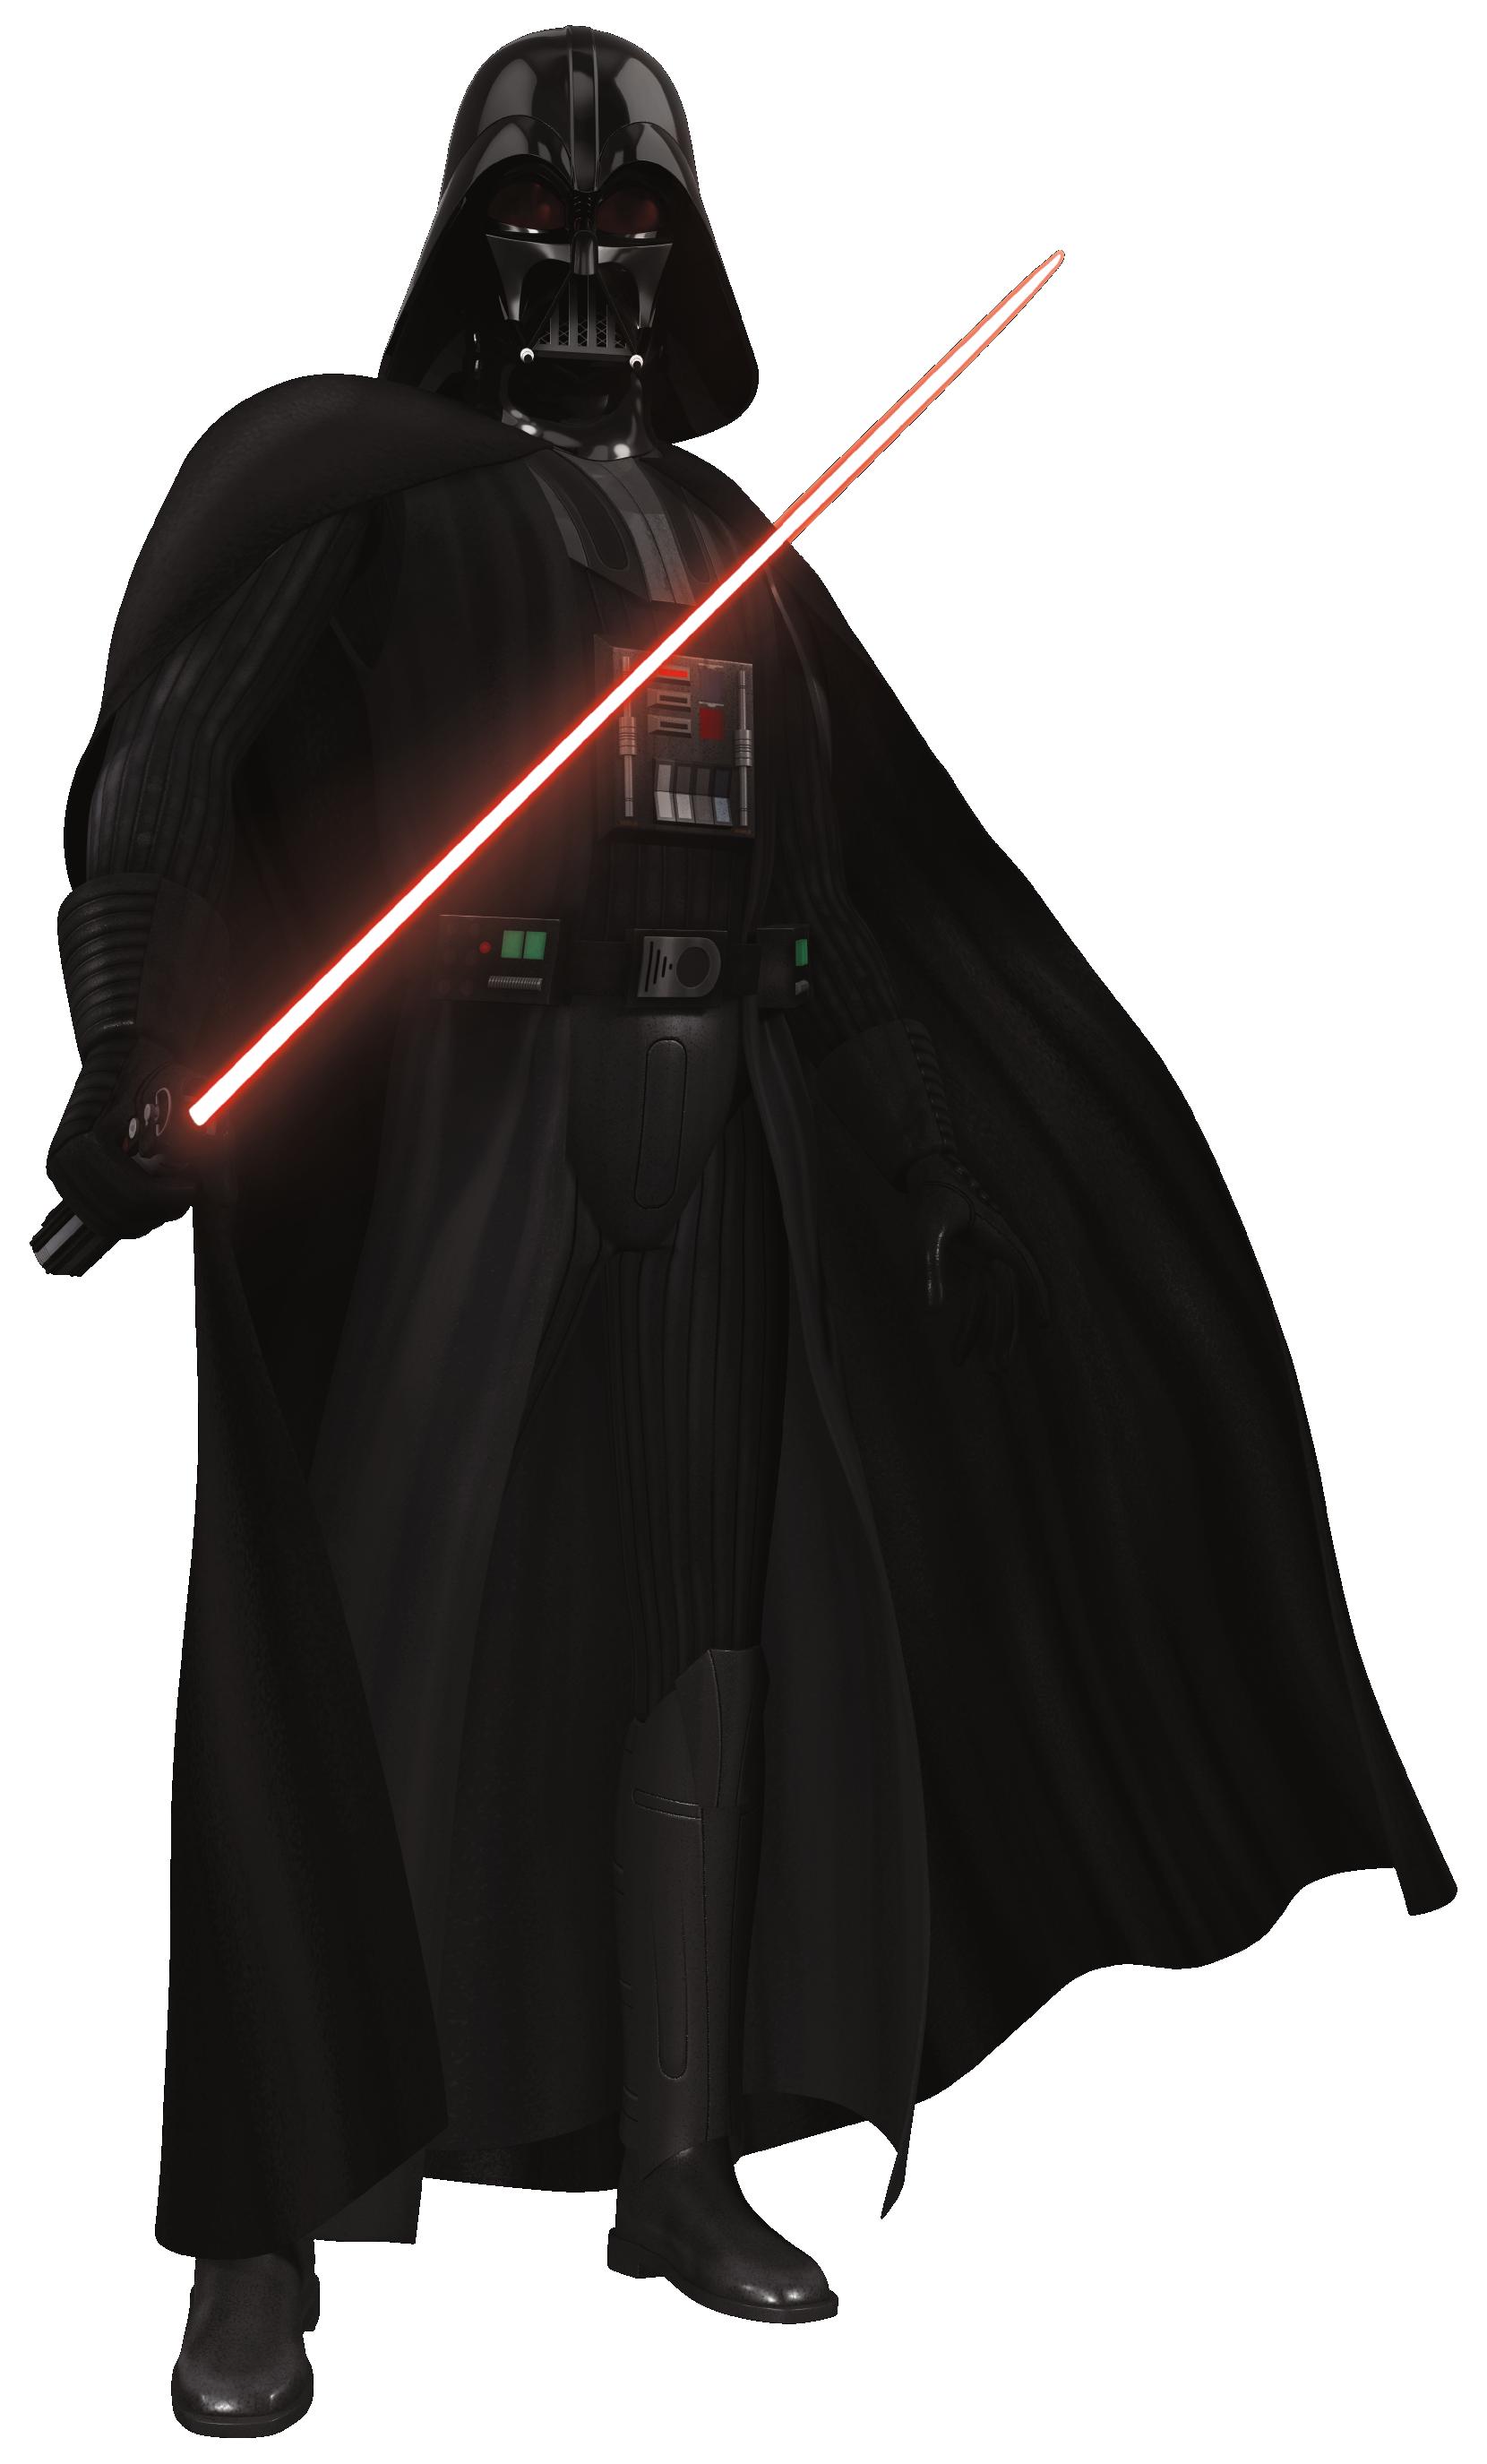 Darth Vader Star Wars PNG Picture.